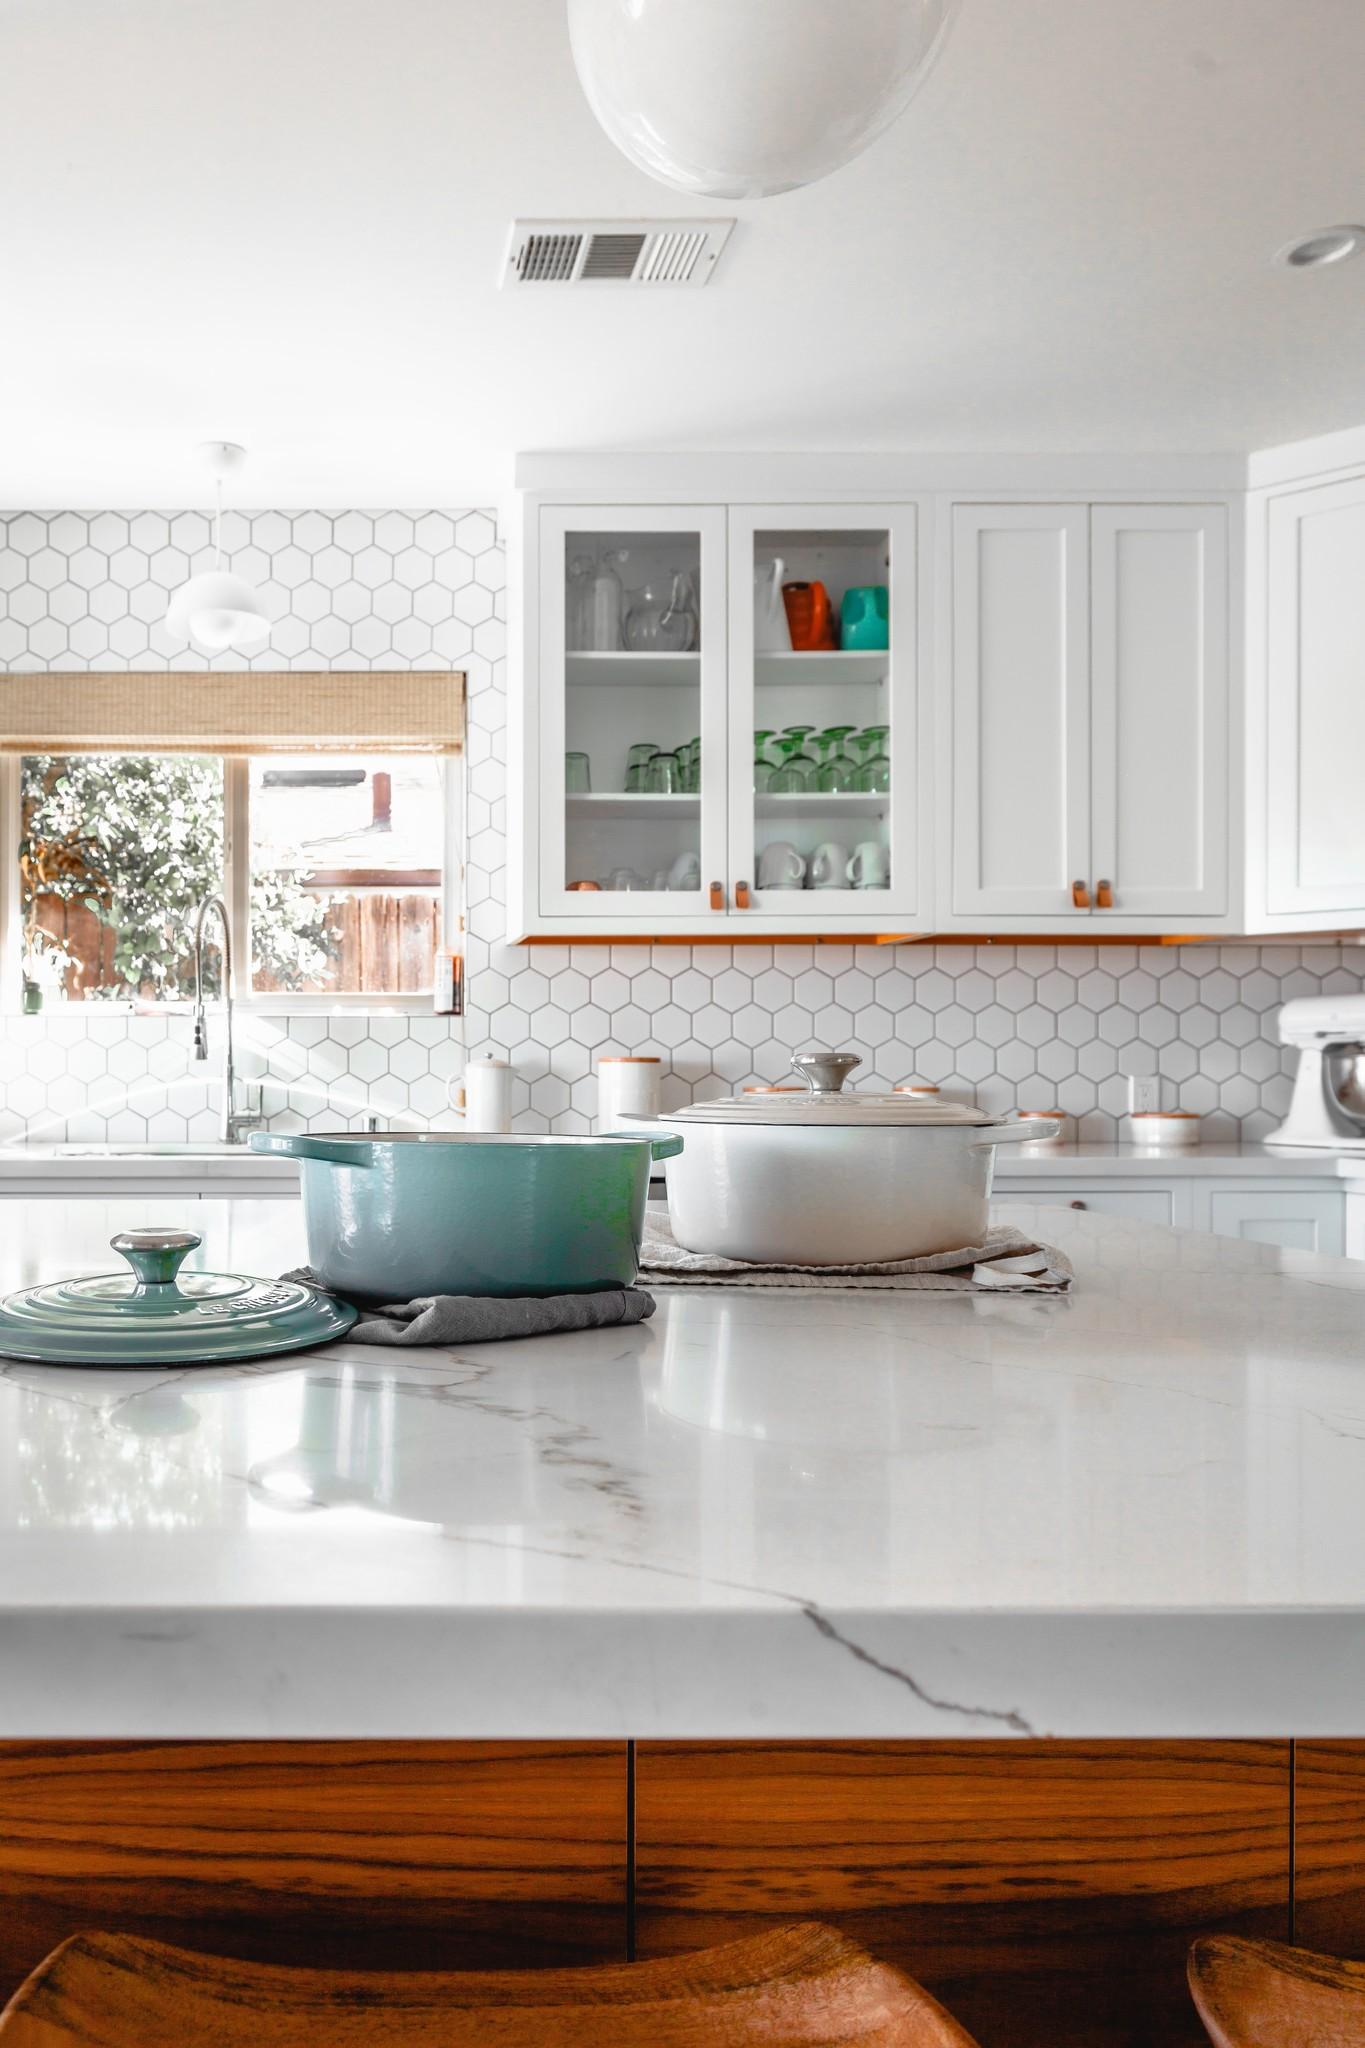 5 Easy Ways to Transform Your Kitchen